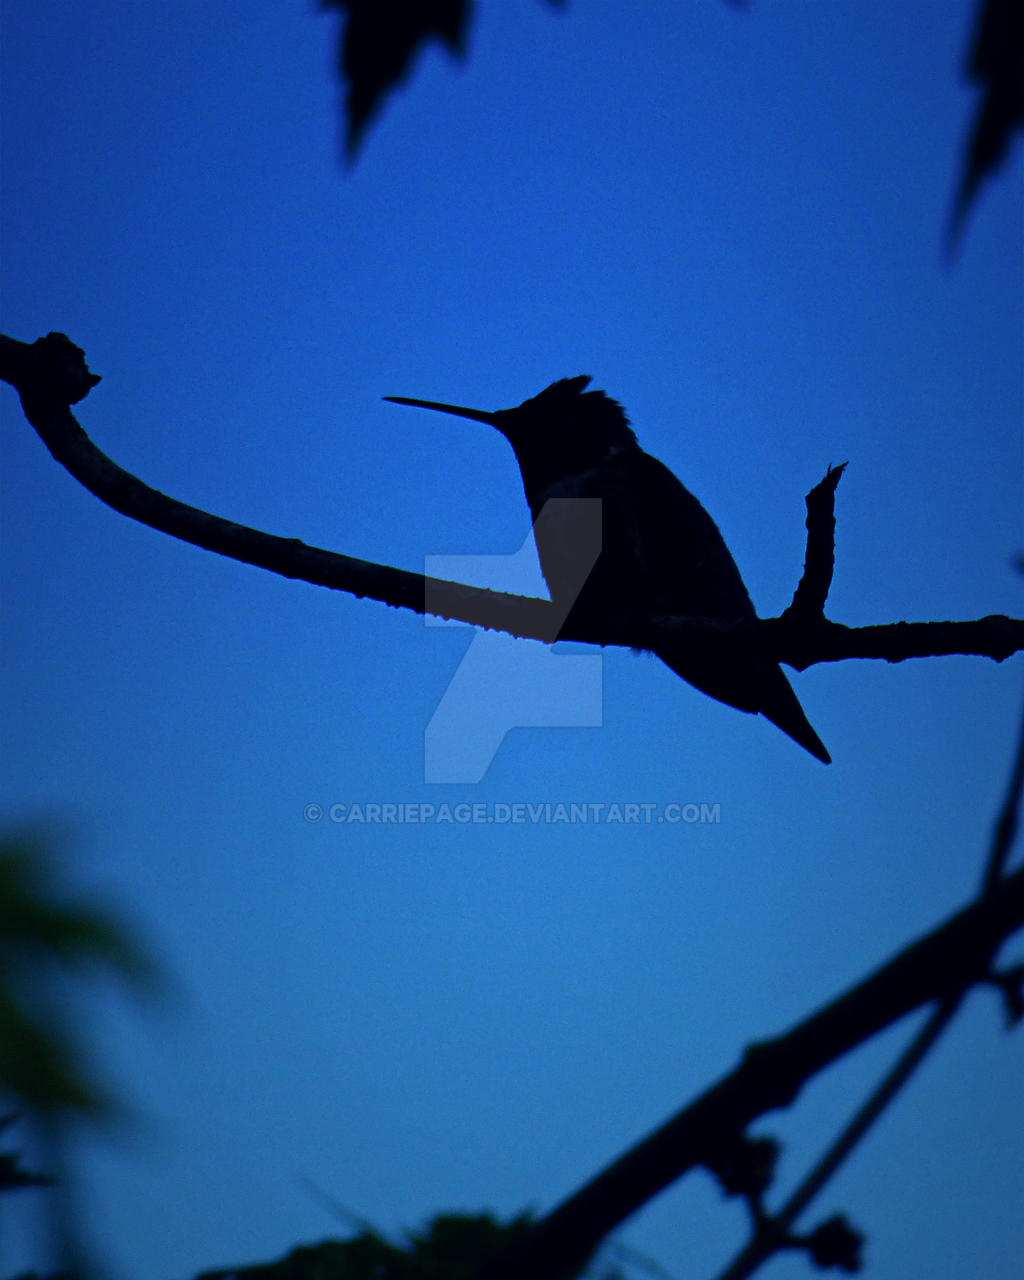 Hush-A-Bye Birdie